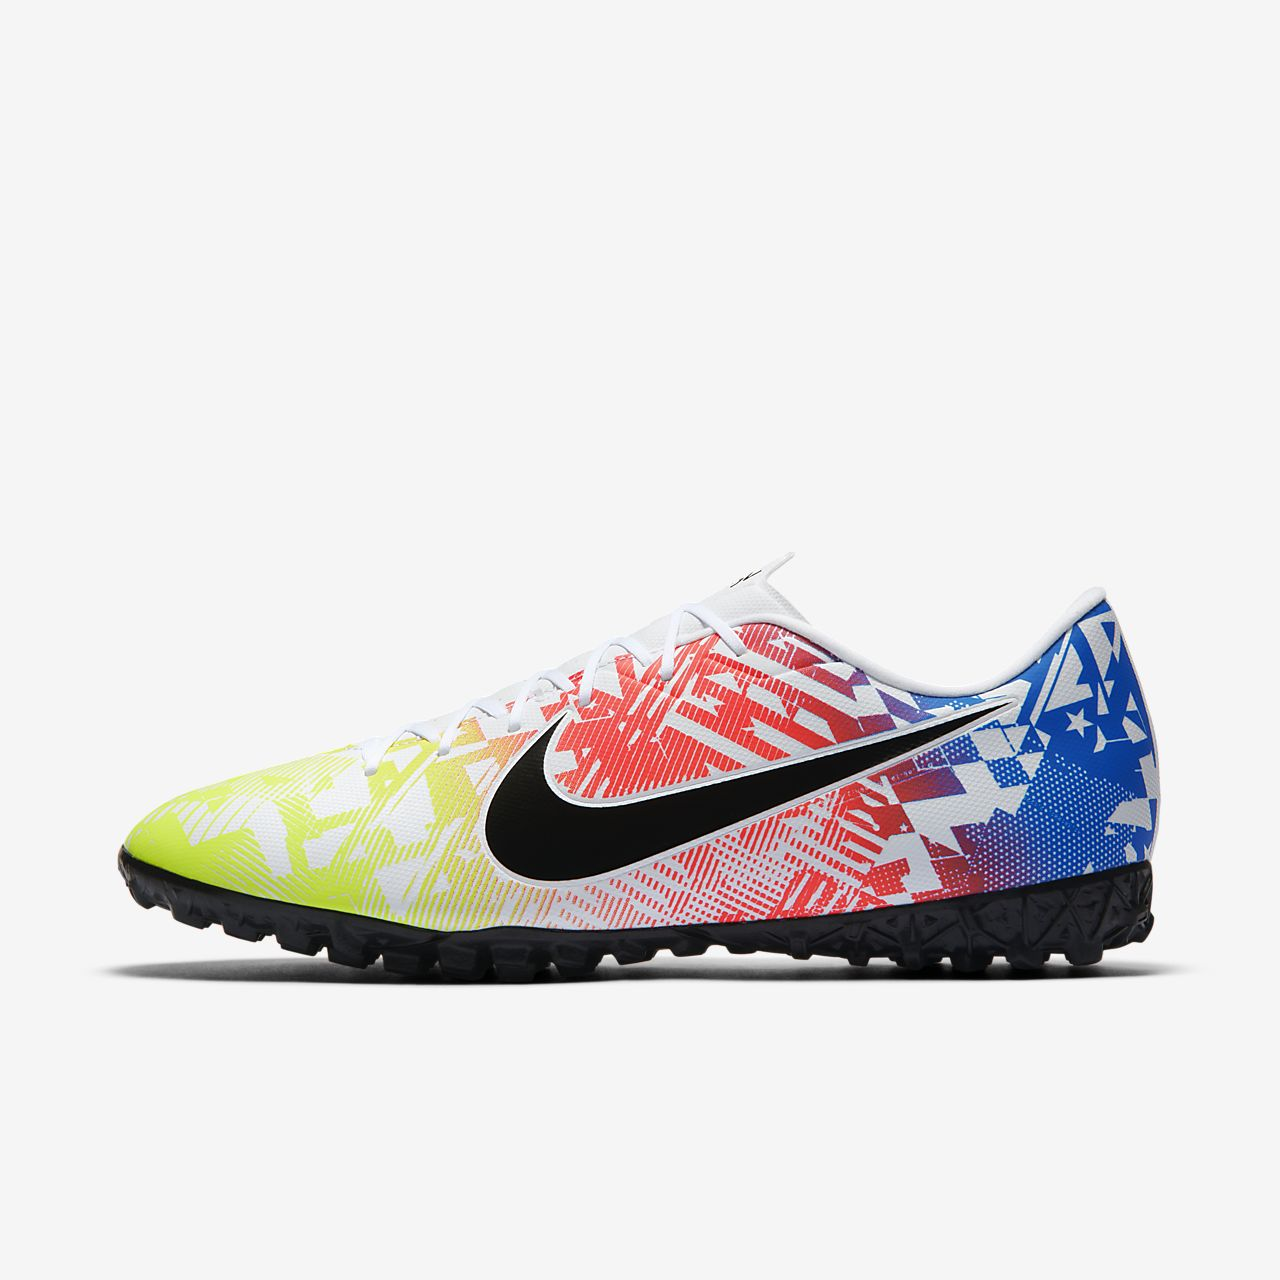 Nike Mercurial Vapor 13 Academy Neymar Jr. TF Artificial-Turf Football Shoe